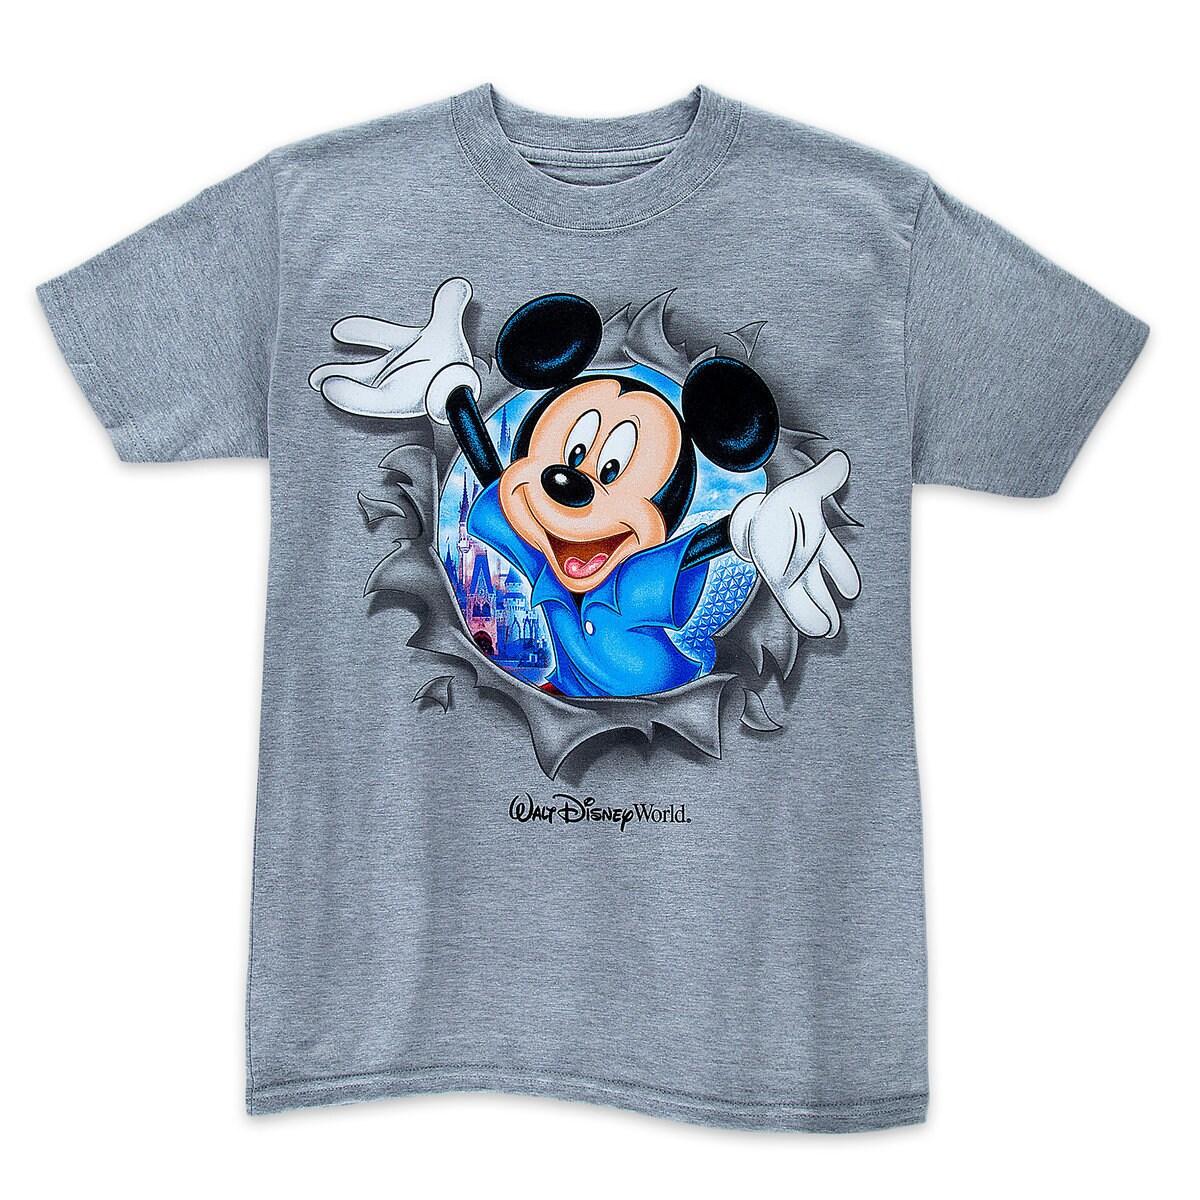 7575e7f03 Mickey Mouse Peek-a-Boo Tee for Baby - Walt Disney World | shopDisney